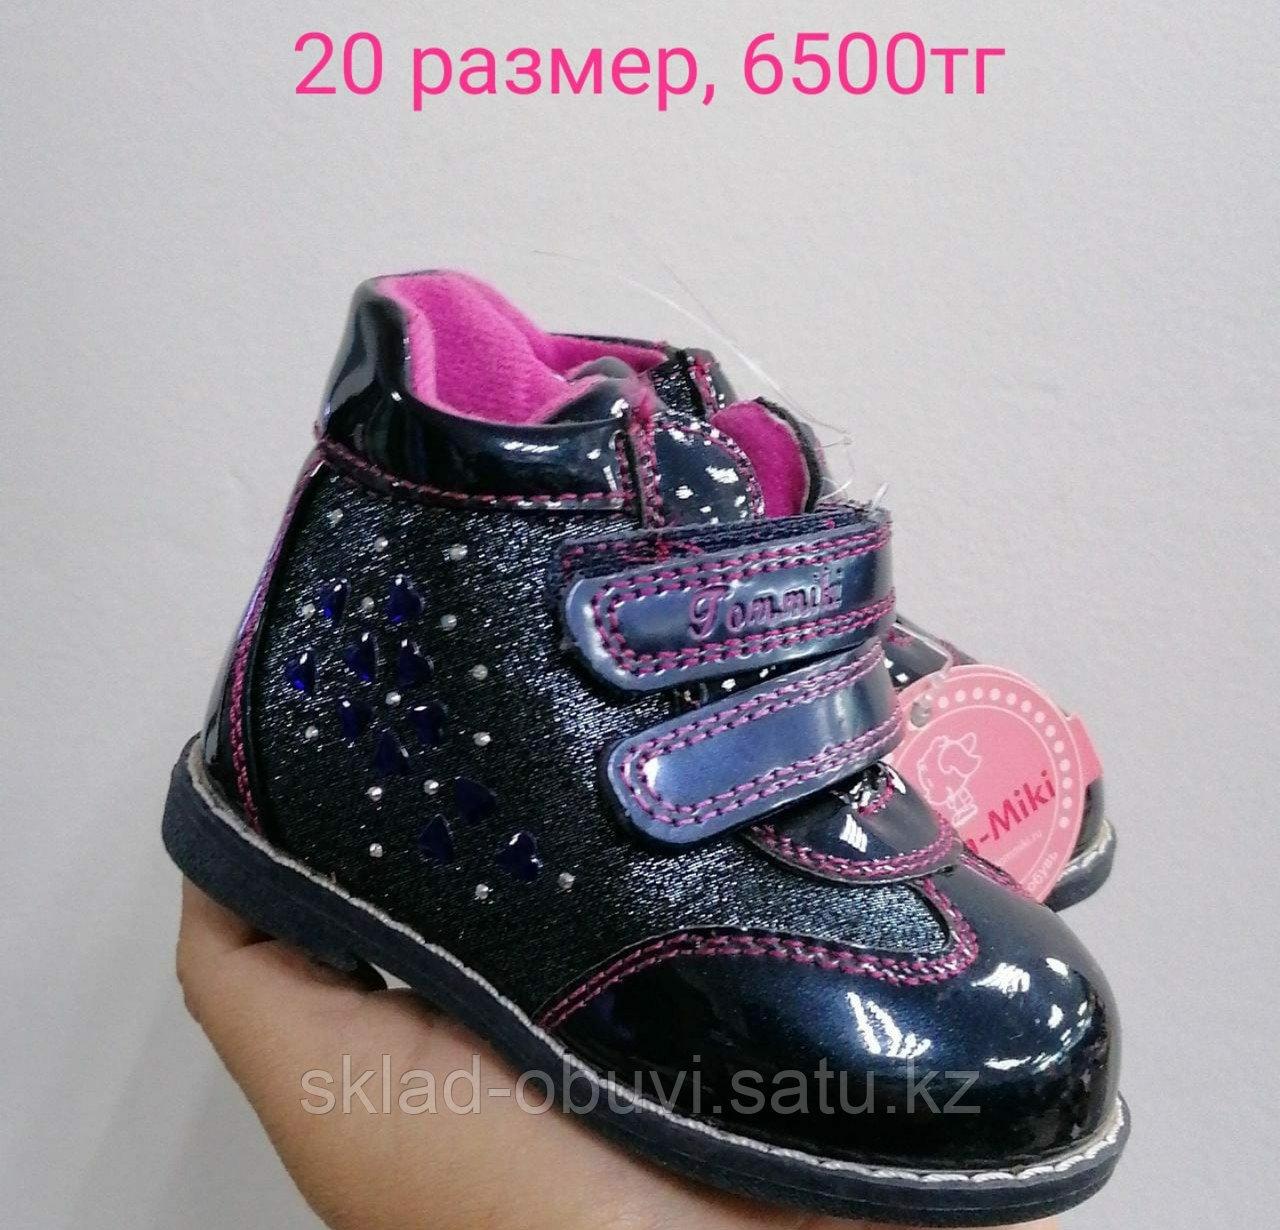 Flamingo. Ботинки детям. - фото 4